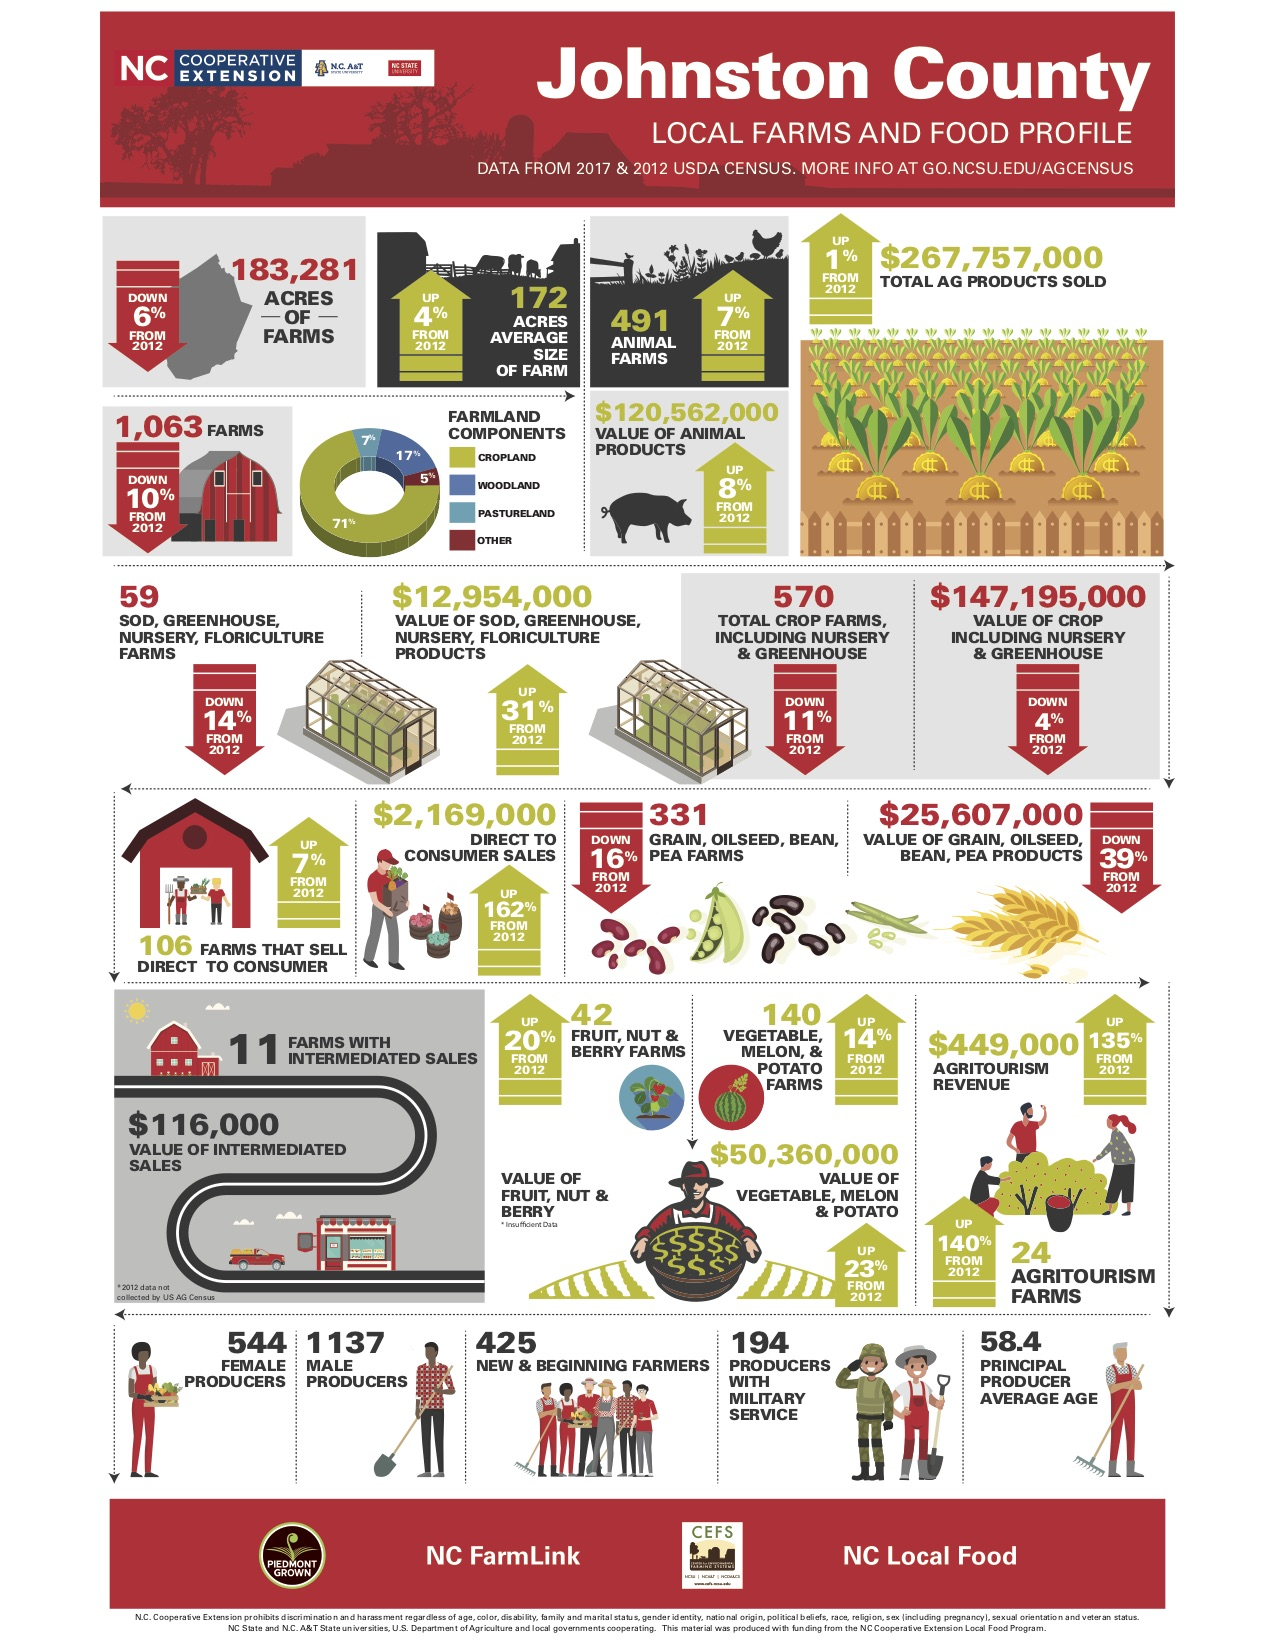 Local farms and food profile